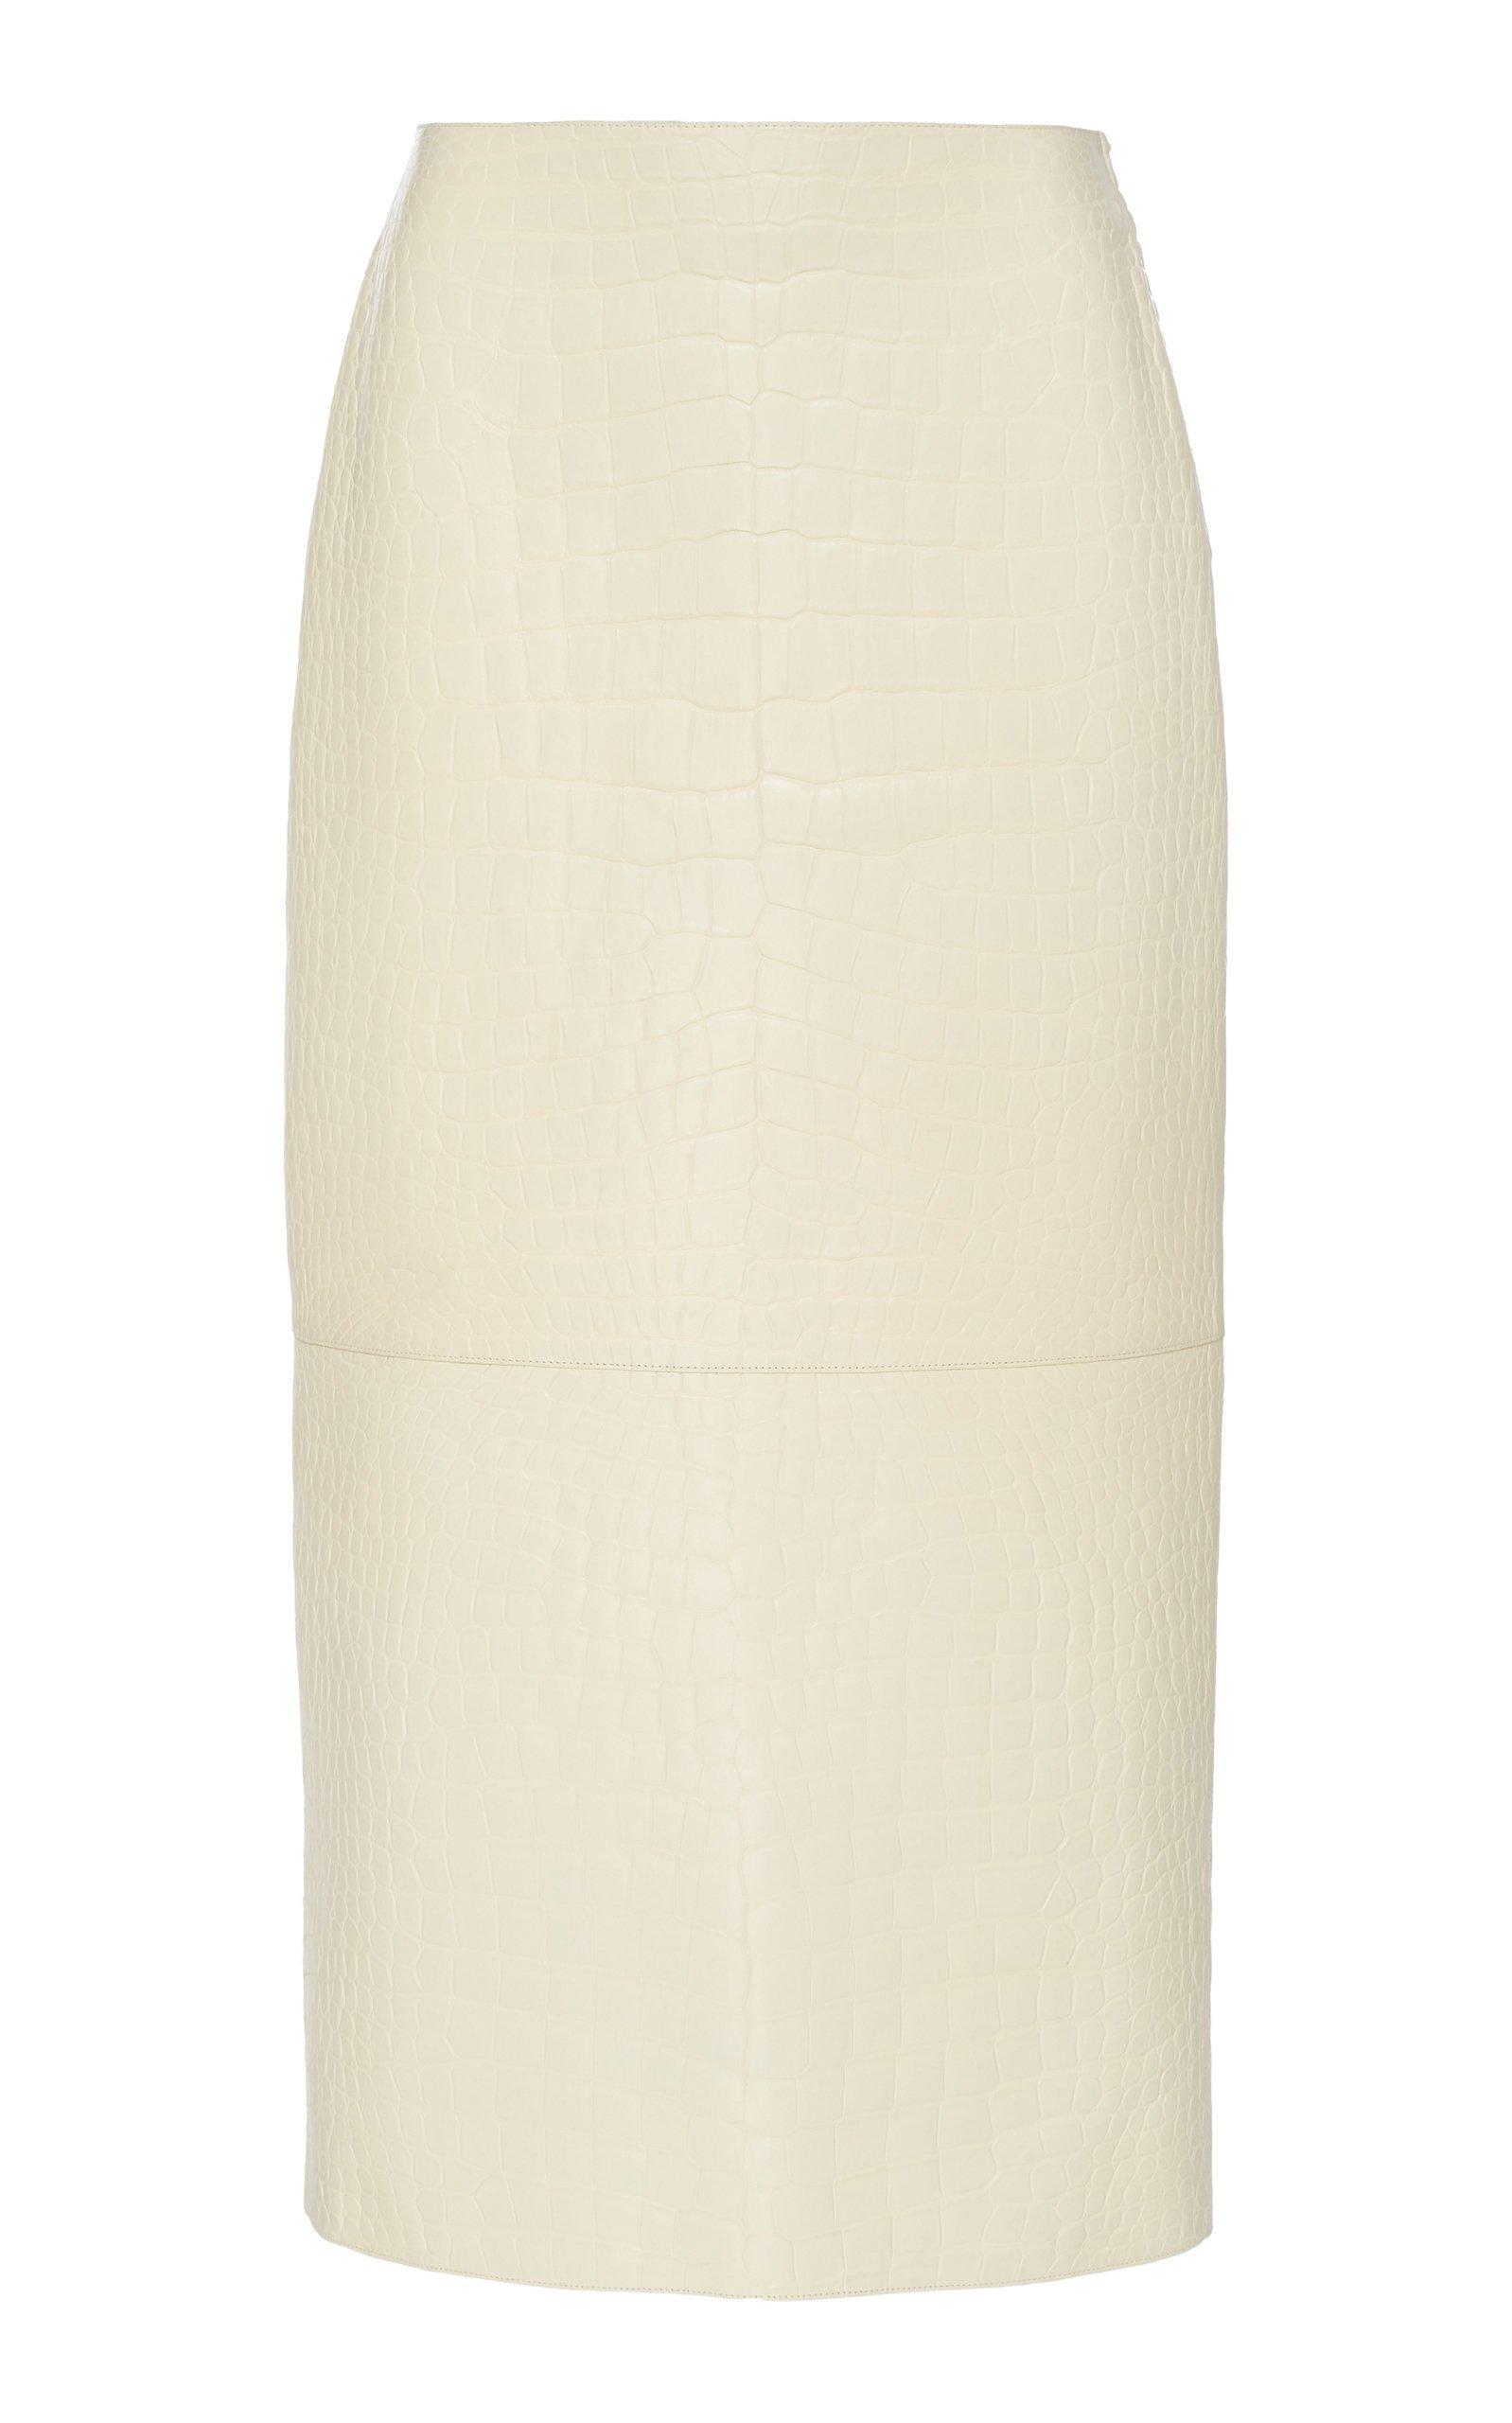 The Row Jenna Crocodile Midi Skirt Size: 8